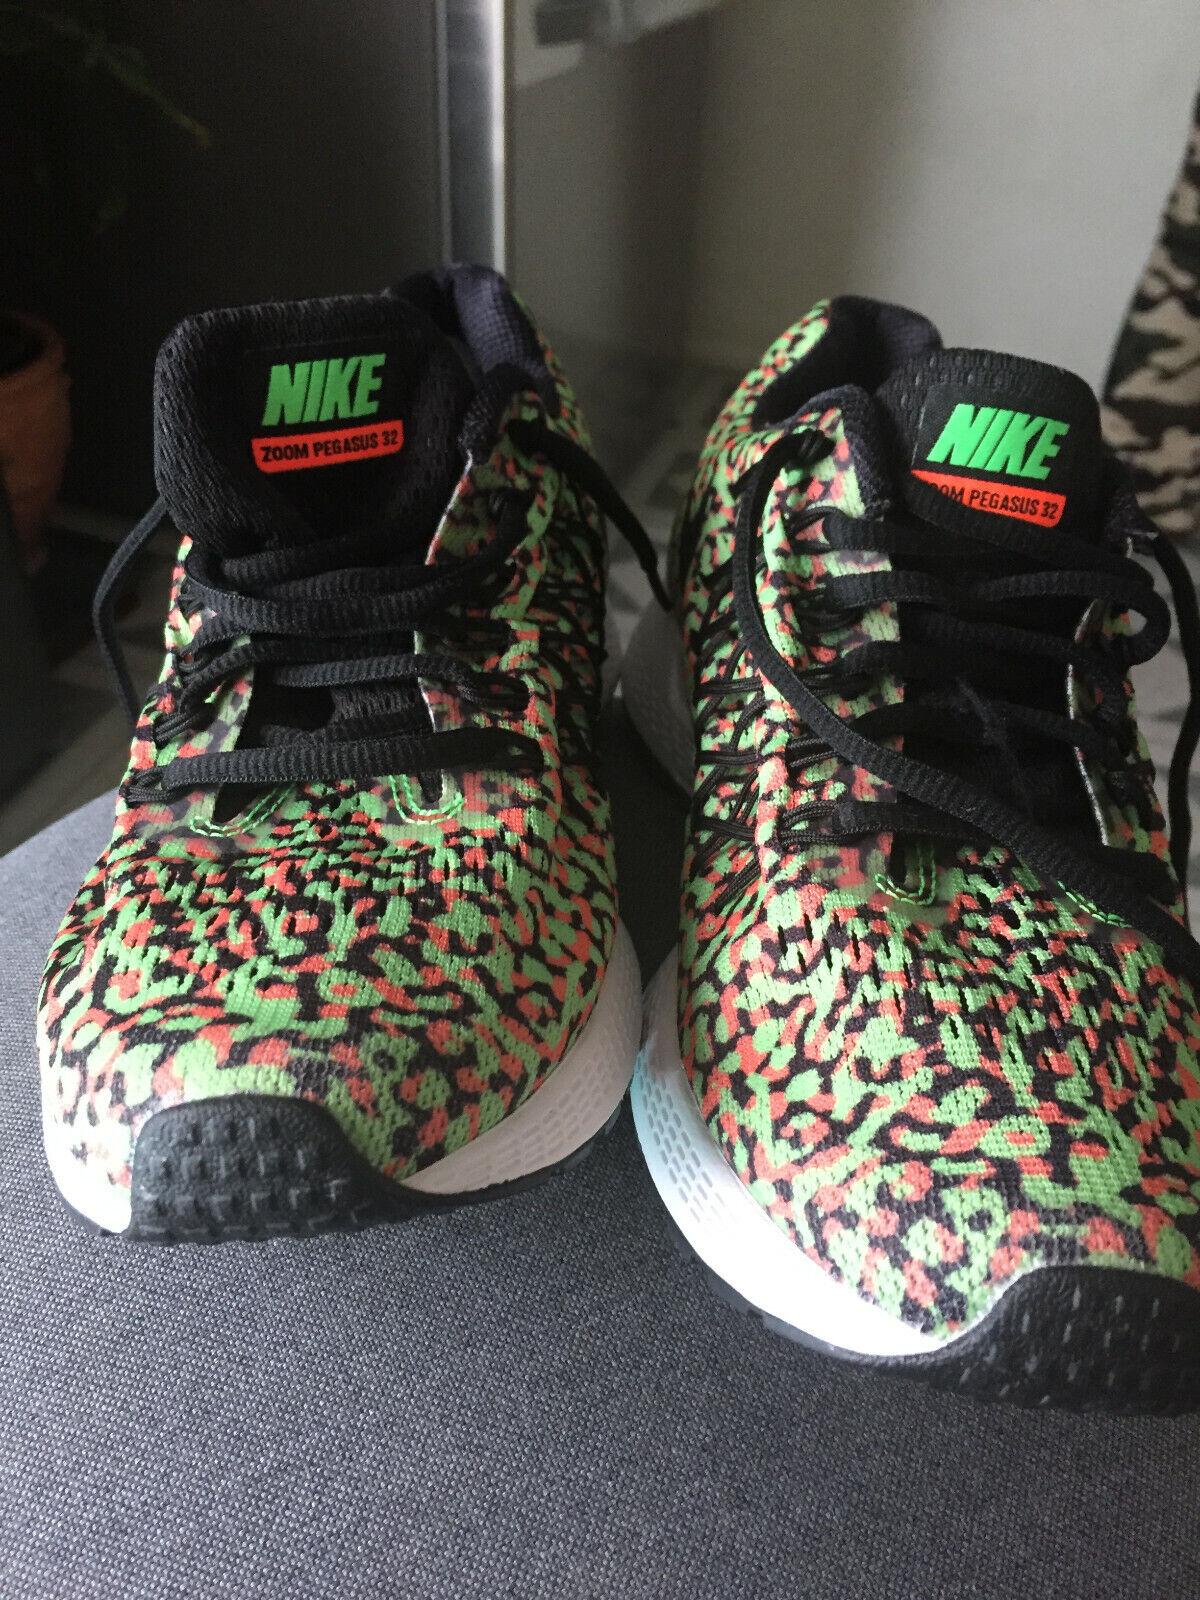 low priced 59ac5 b8d33 Nike Nike Nike Air Zoom Pegasus 32 green with tiger stripes ...